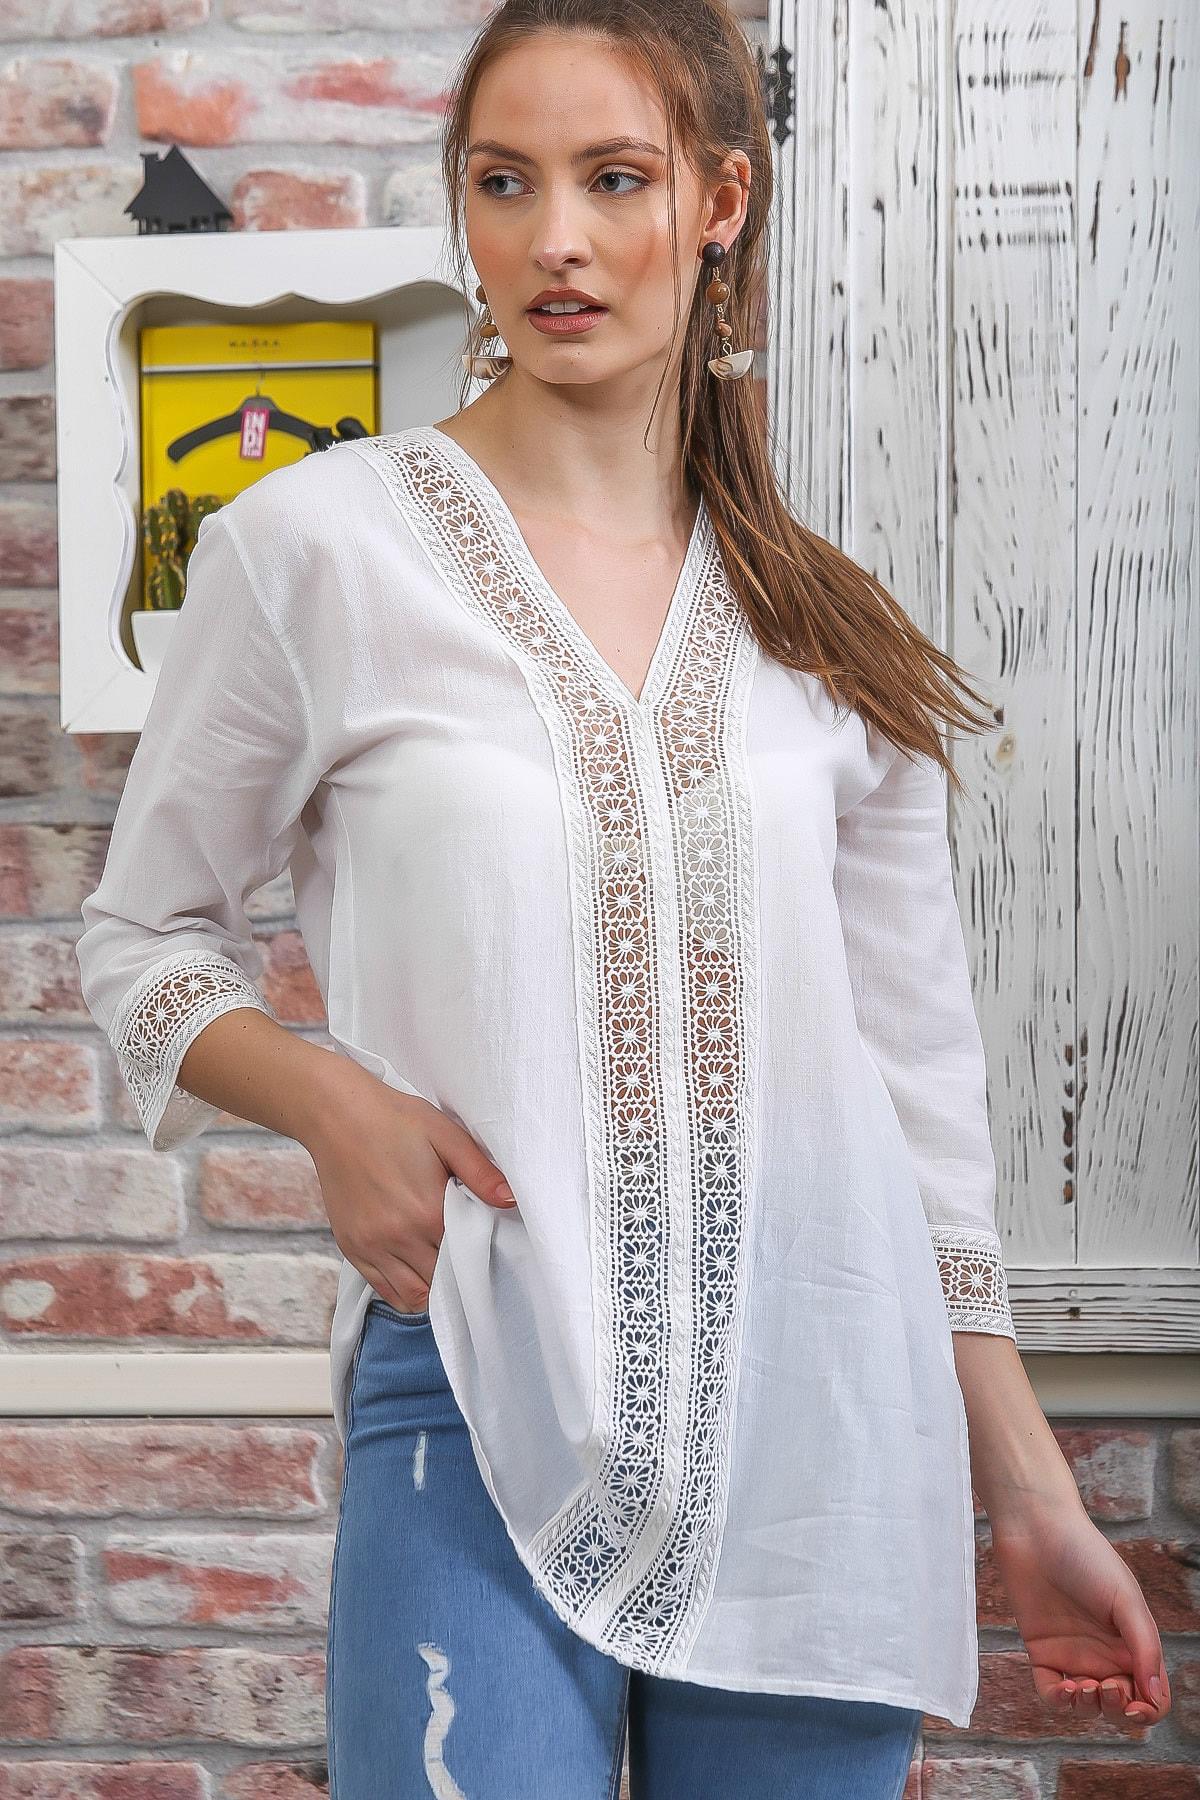 Chiccy Kadın Beyaz Dantel Şerit Detaylı 3/4 Kol Dokuma Bluz M10010200BL95437